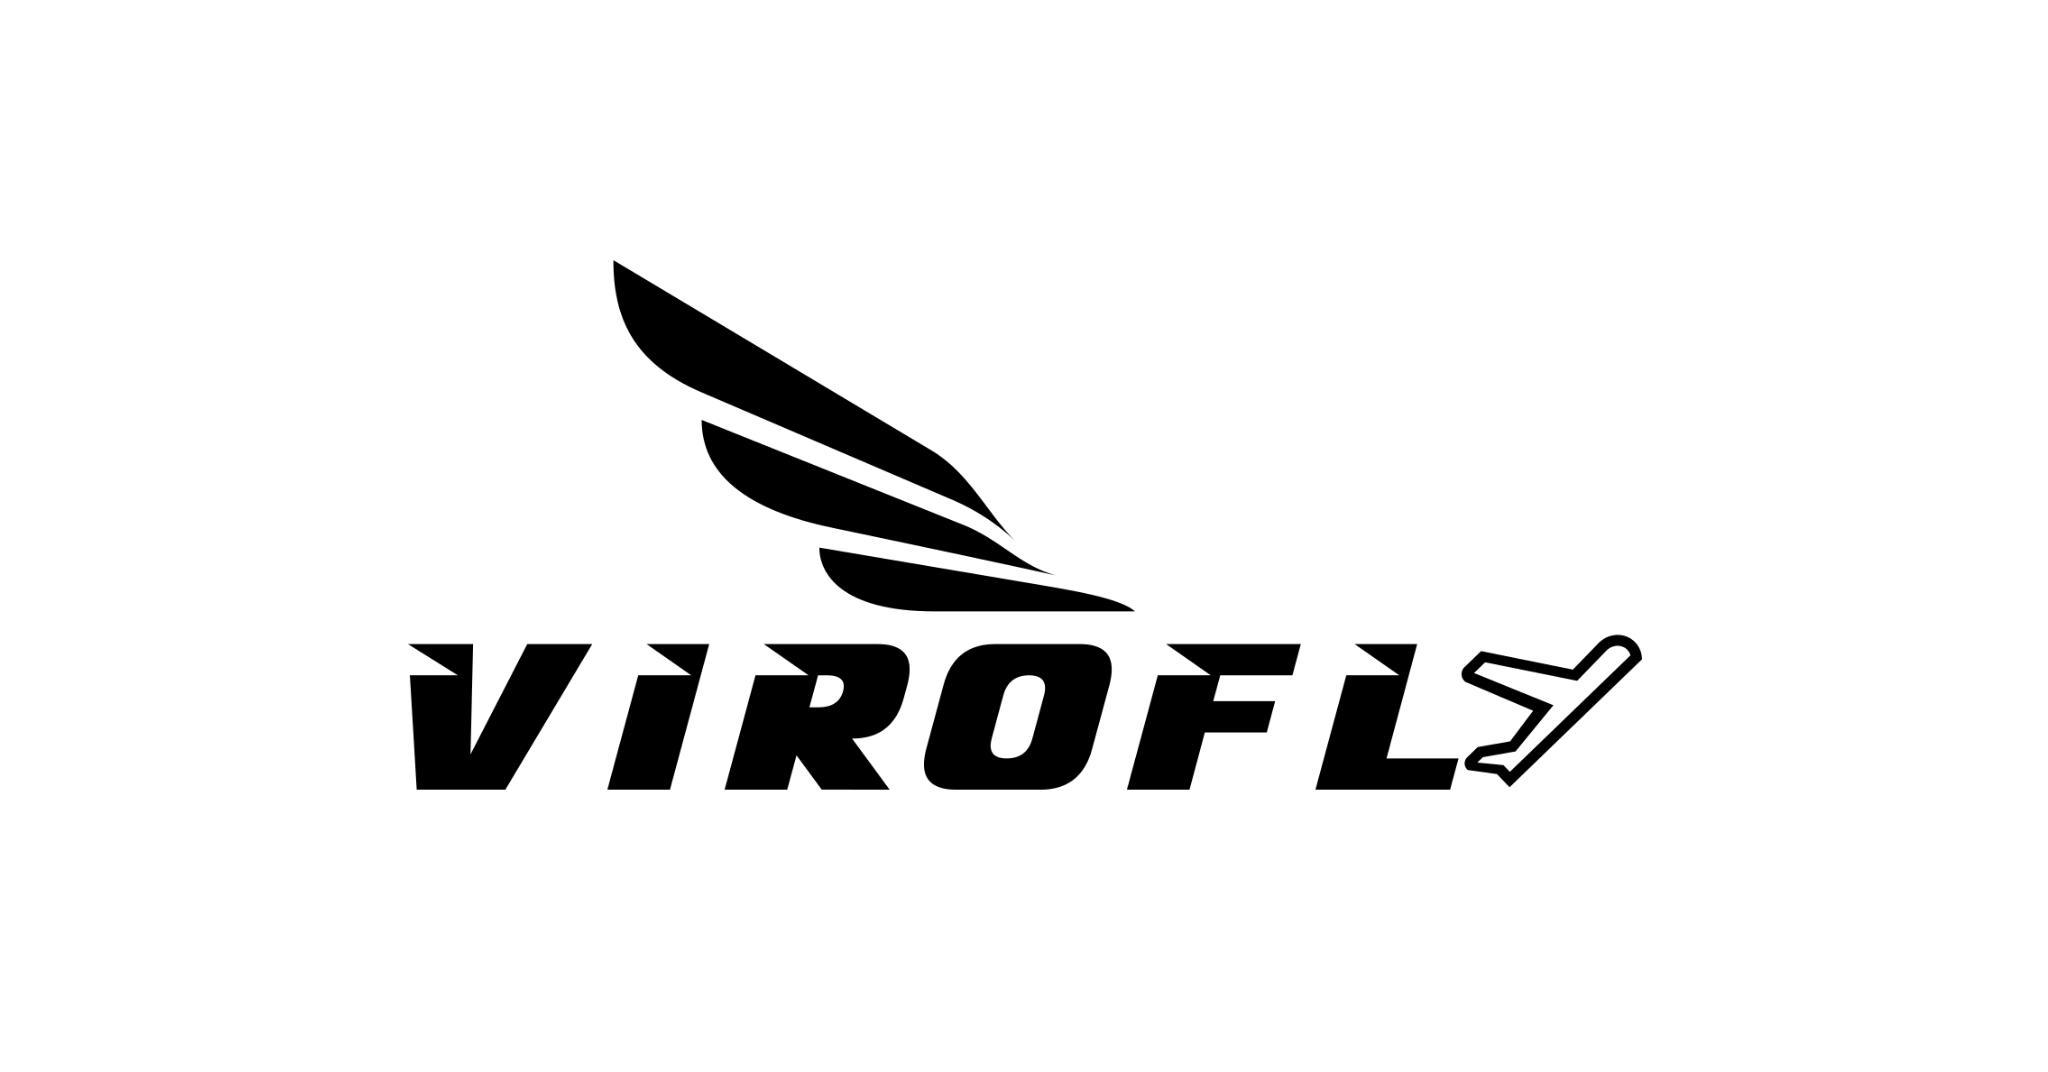 ViroFLY